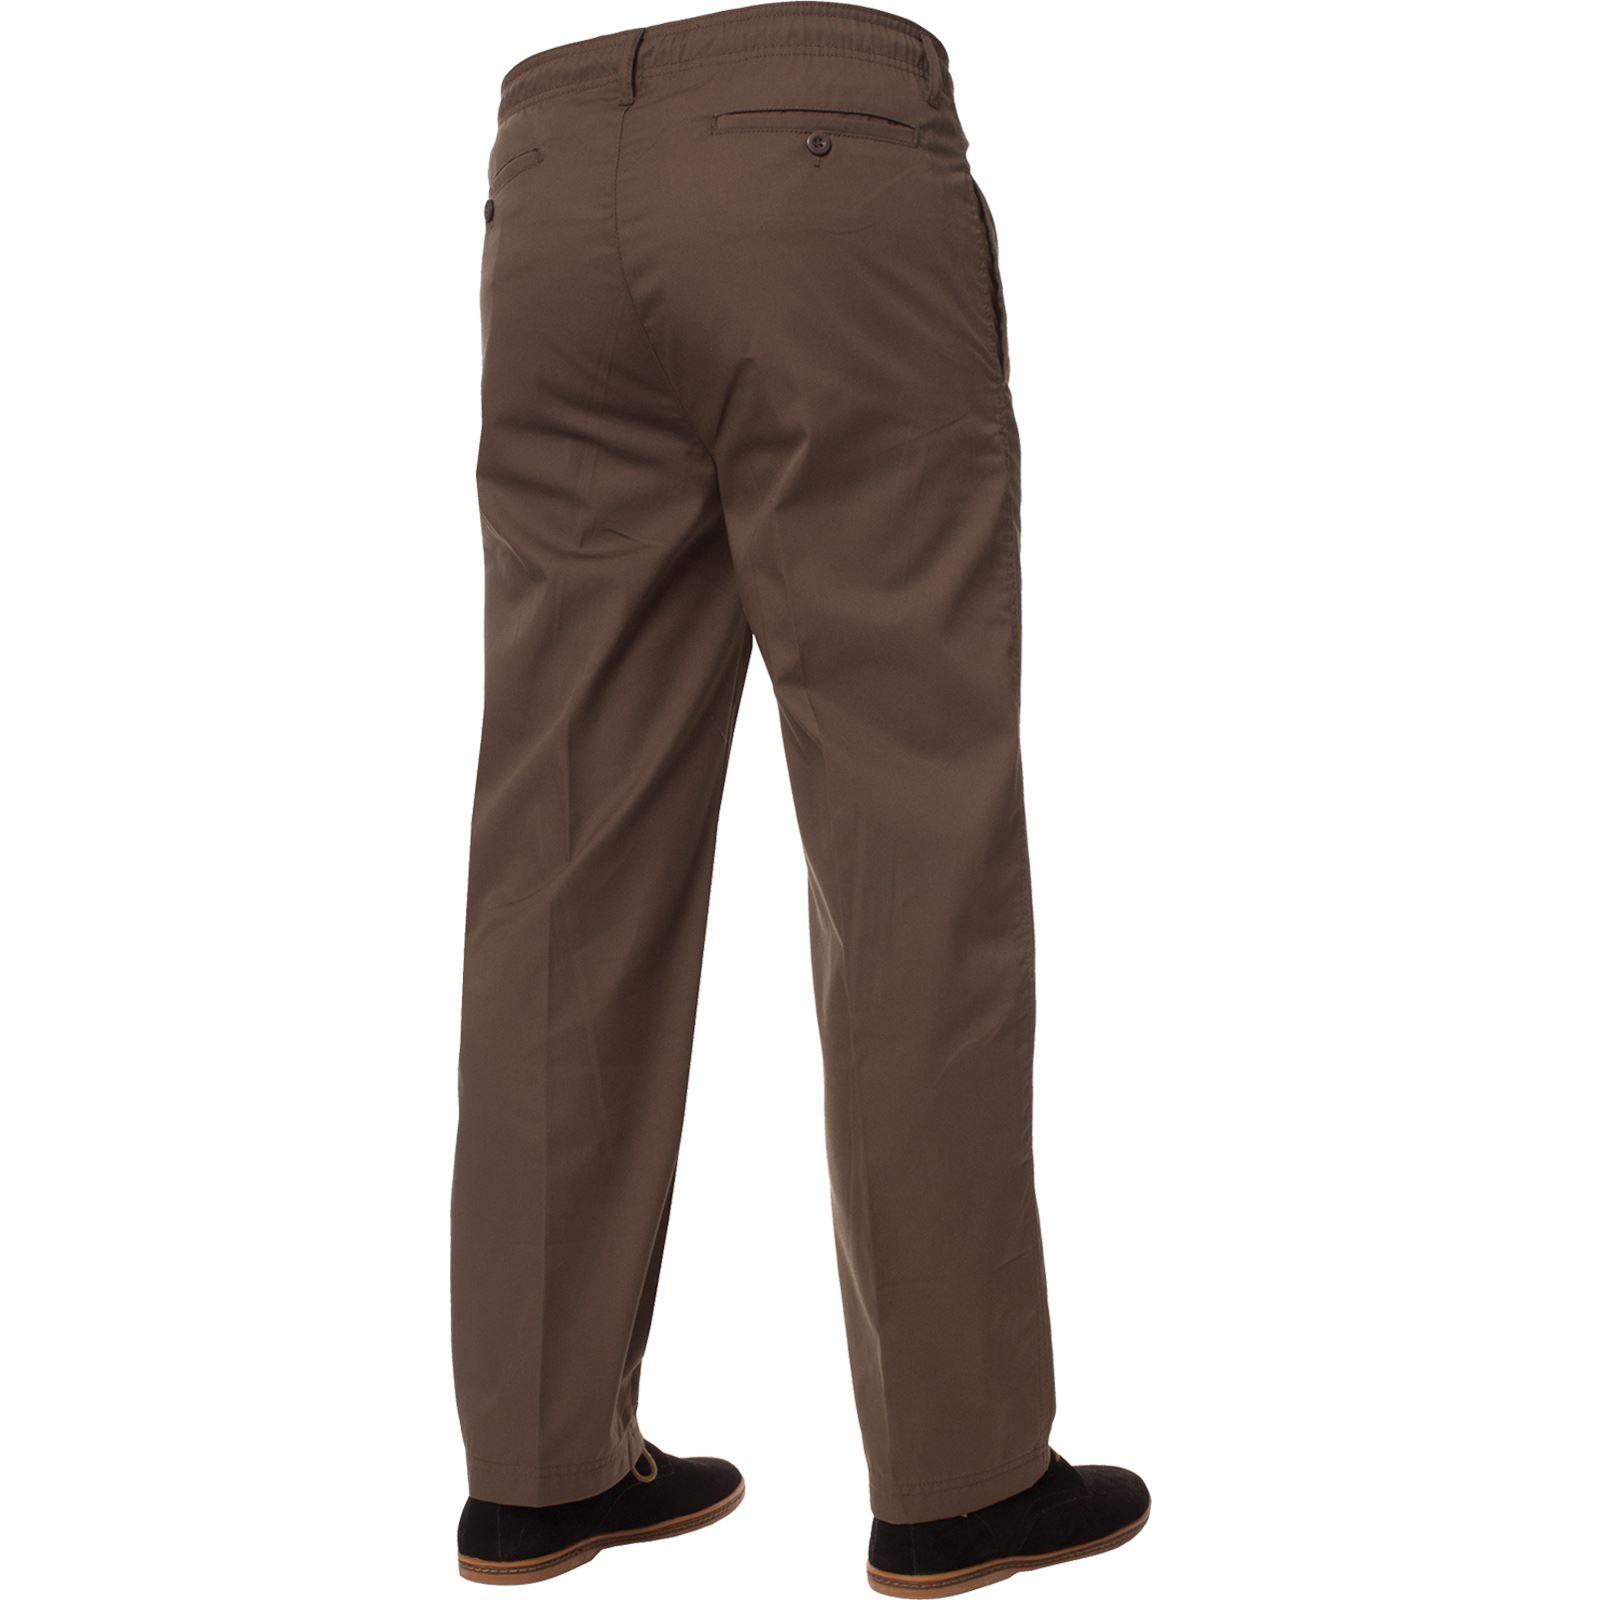 Para-Hombres-Pantalones-De-Rugby-Kruze-cintura-elastica-con-cordon-pantalones-REGULAR-King-Tamanos miniatura 16